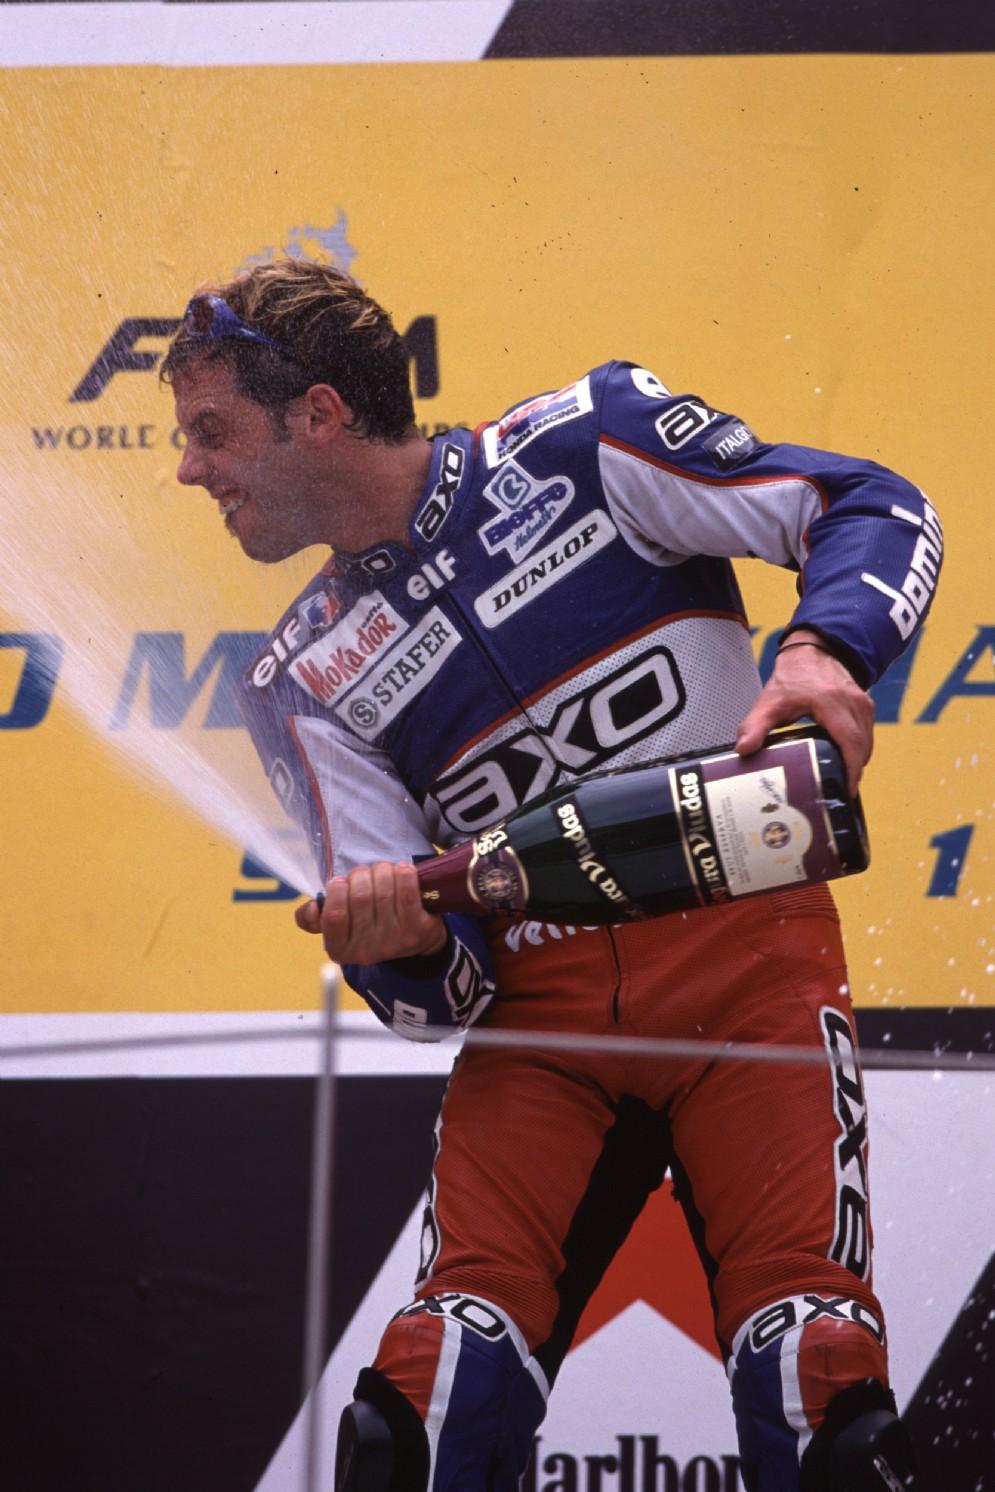 1999: la prima vittoria è firmata Loris Capirossi